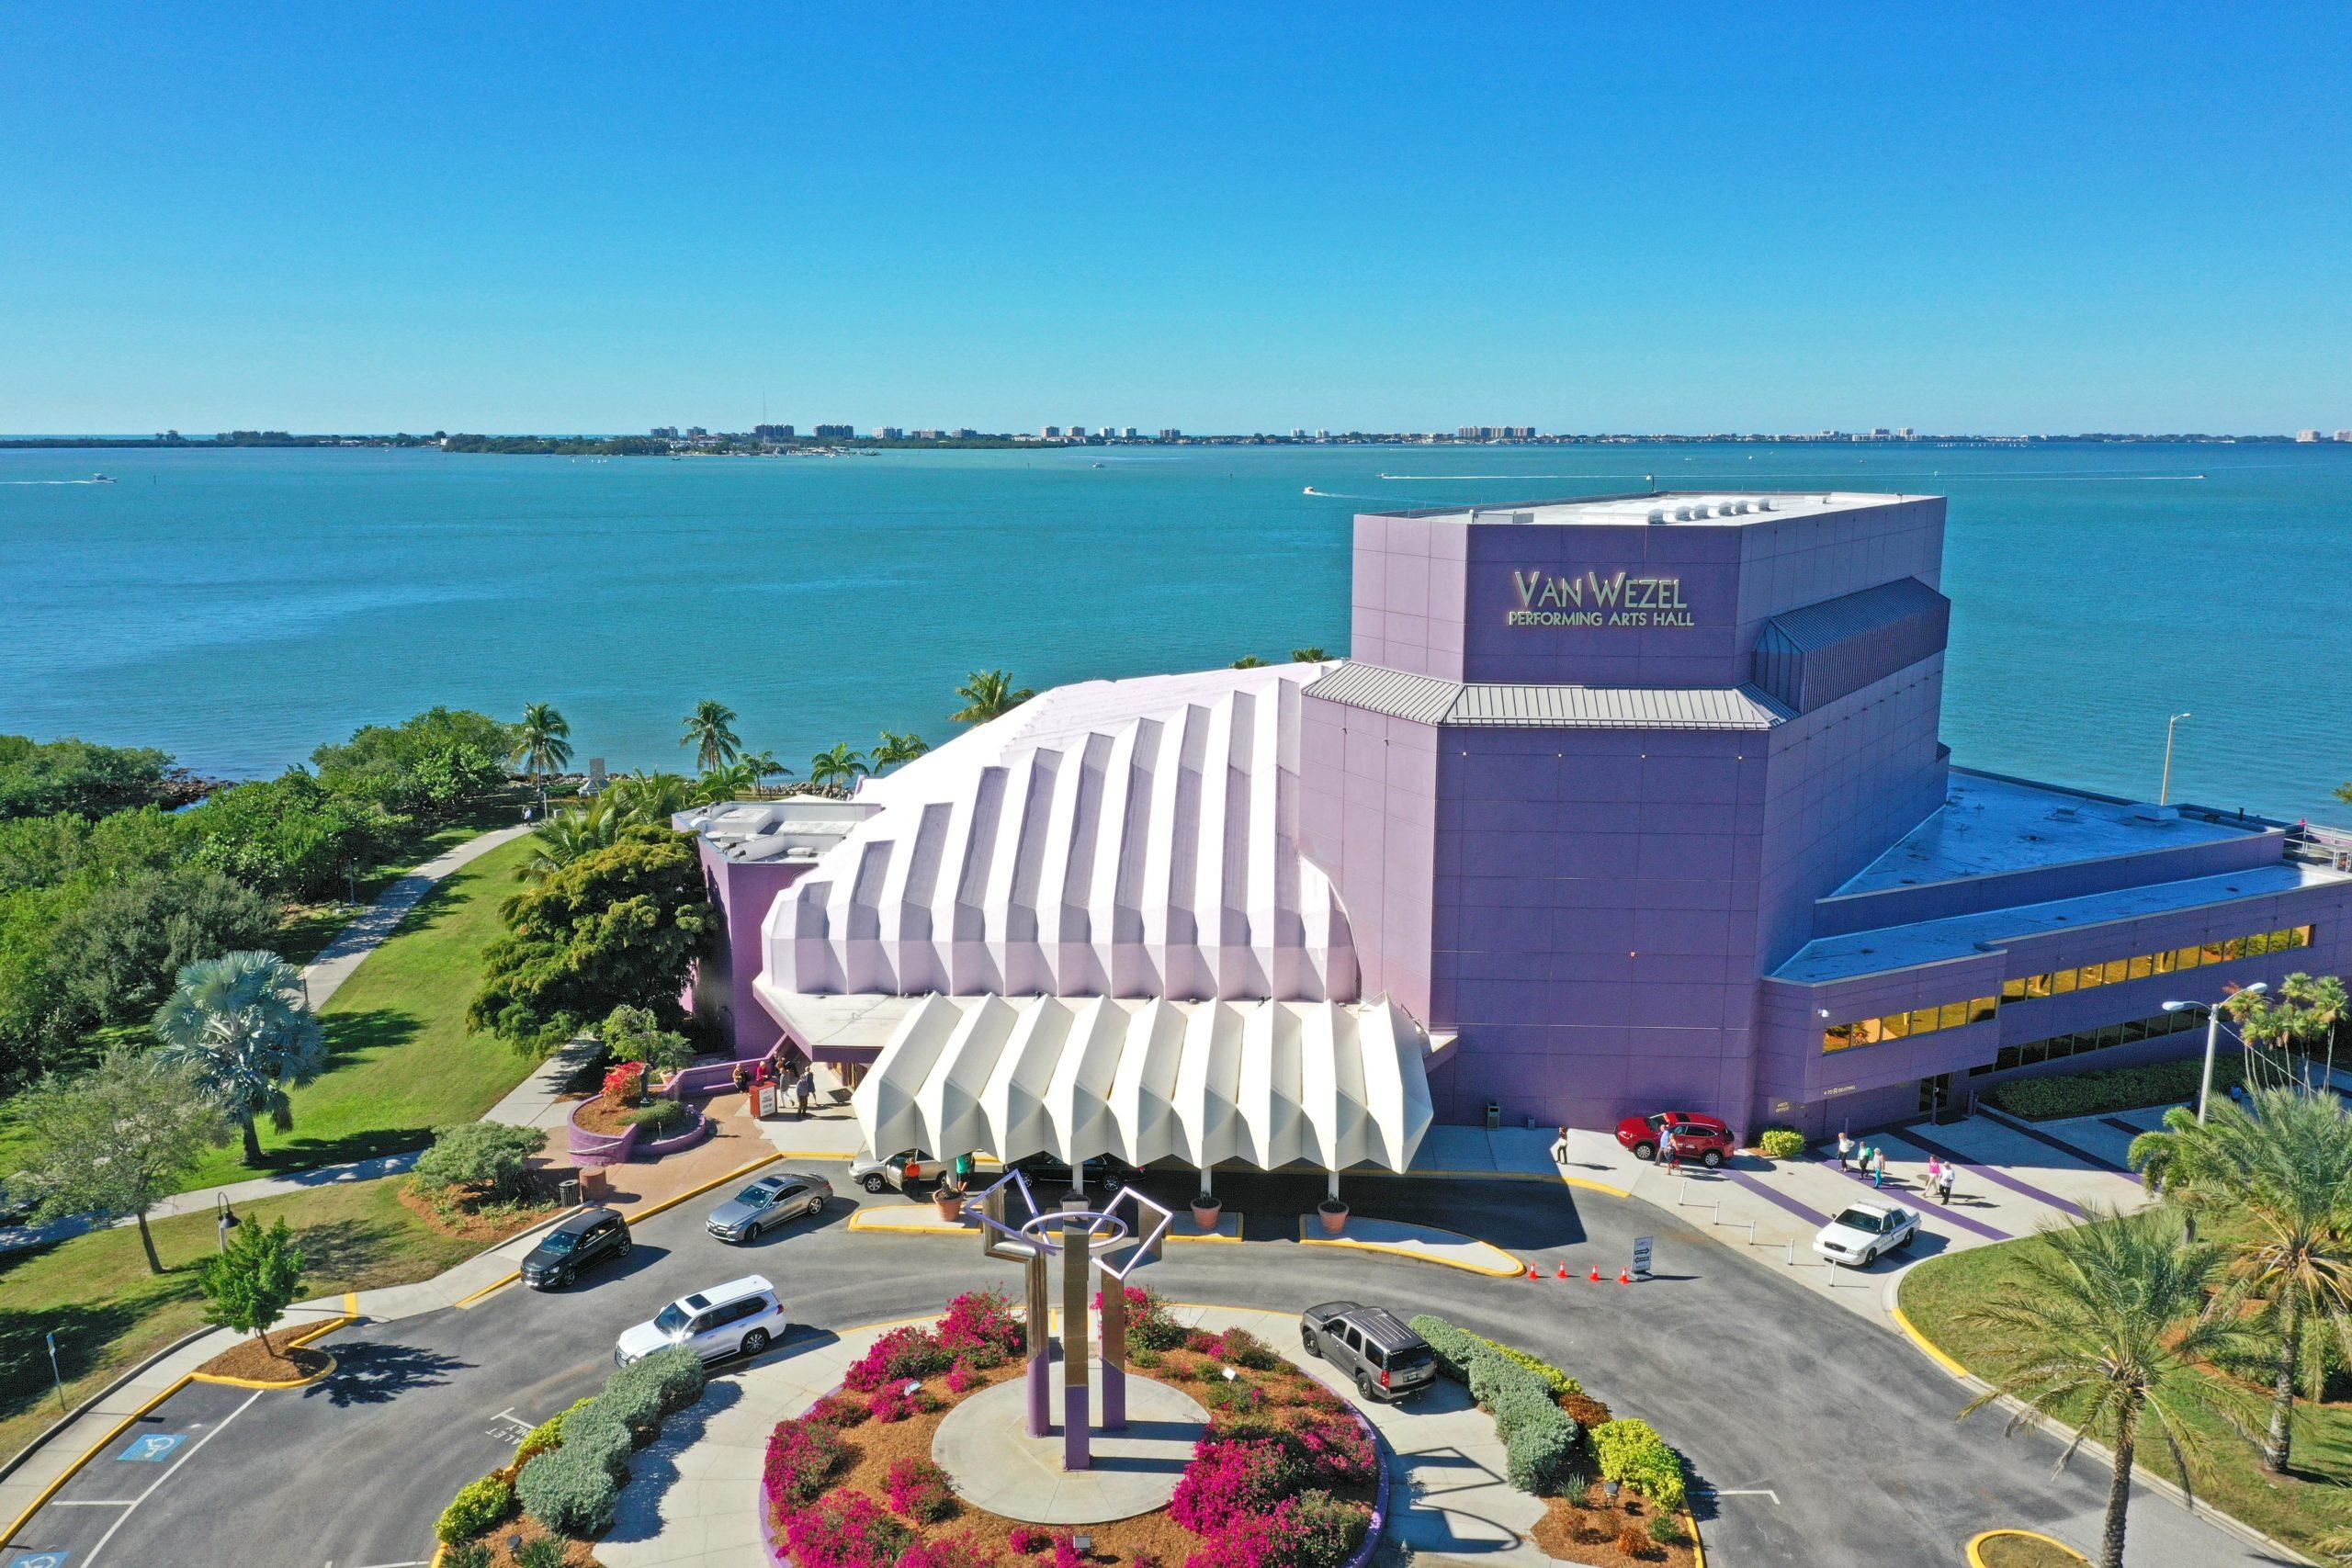 Sarasota's Van Wezel Goes Virtual With Happy Hour Concert photo